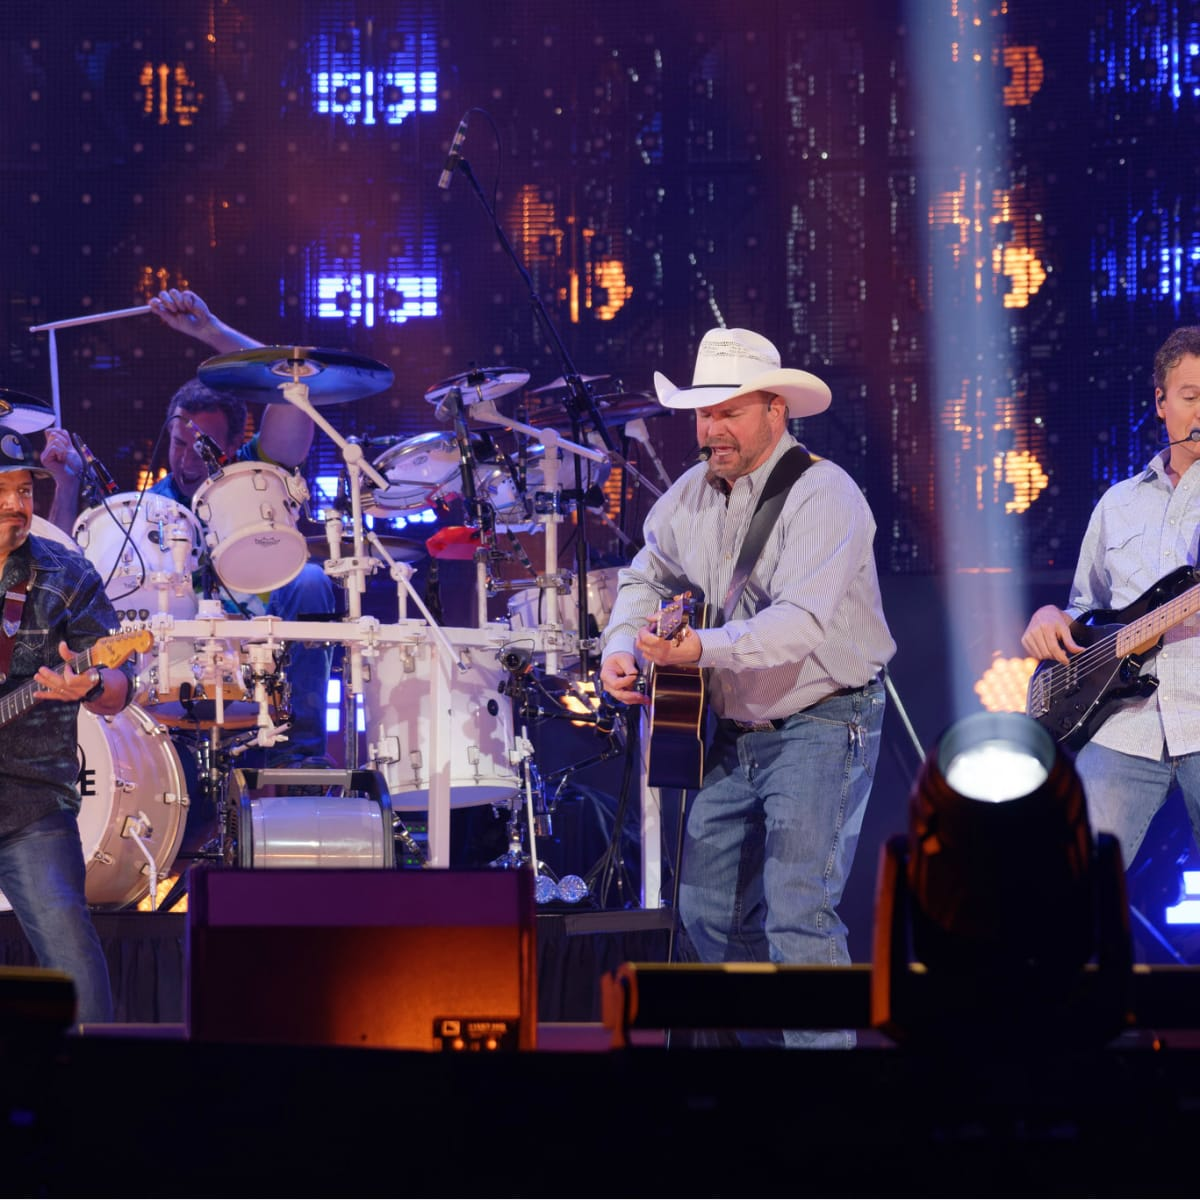 Garth Brooks opening night RodeoHouston band shot